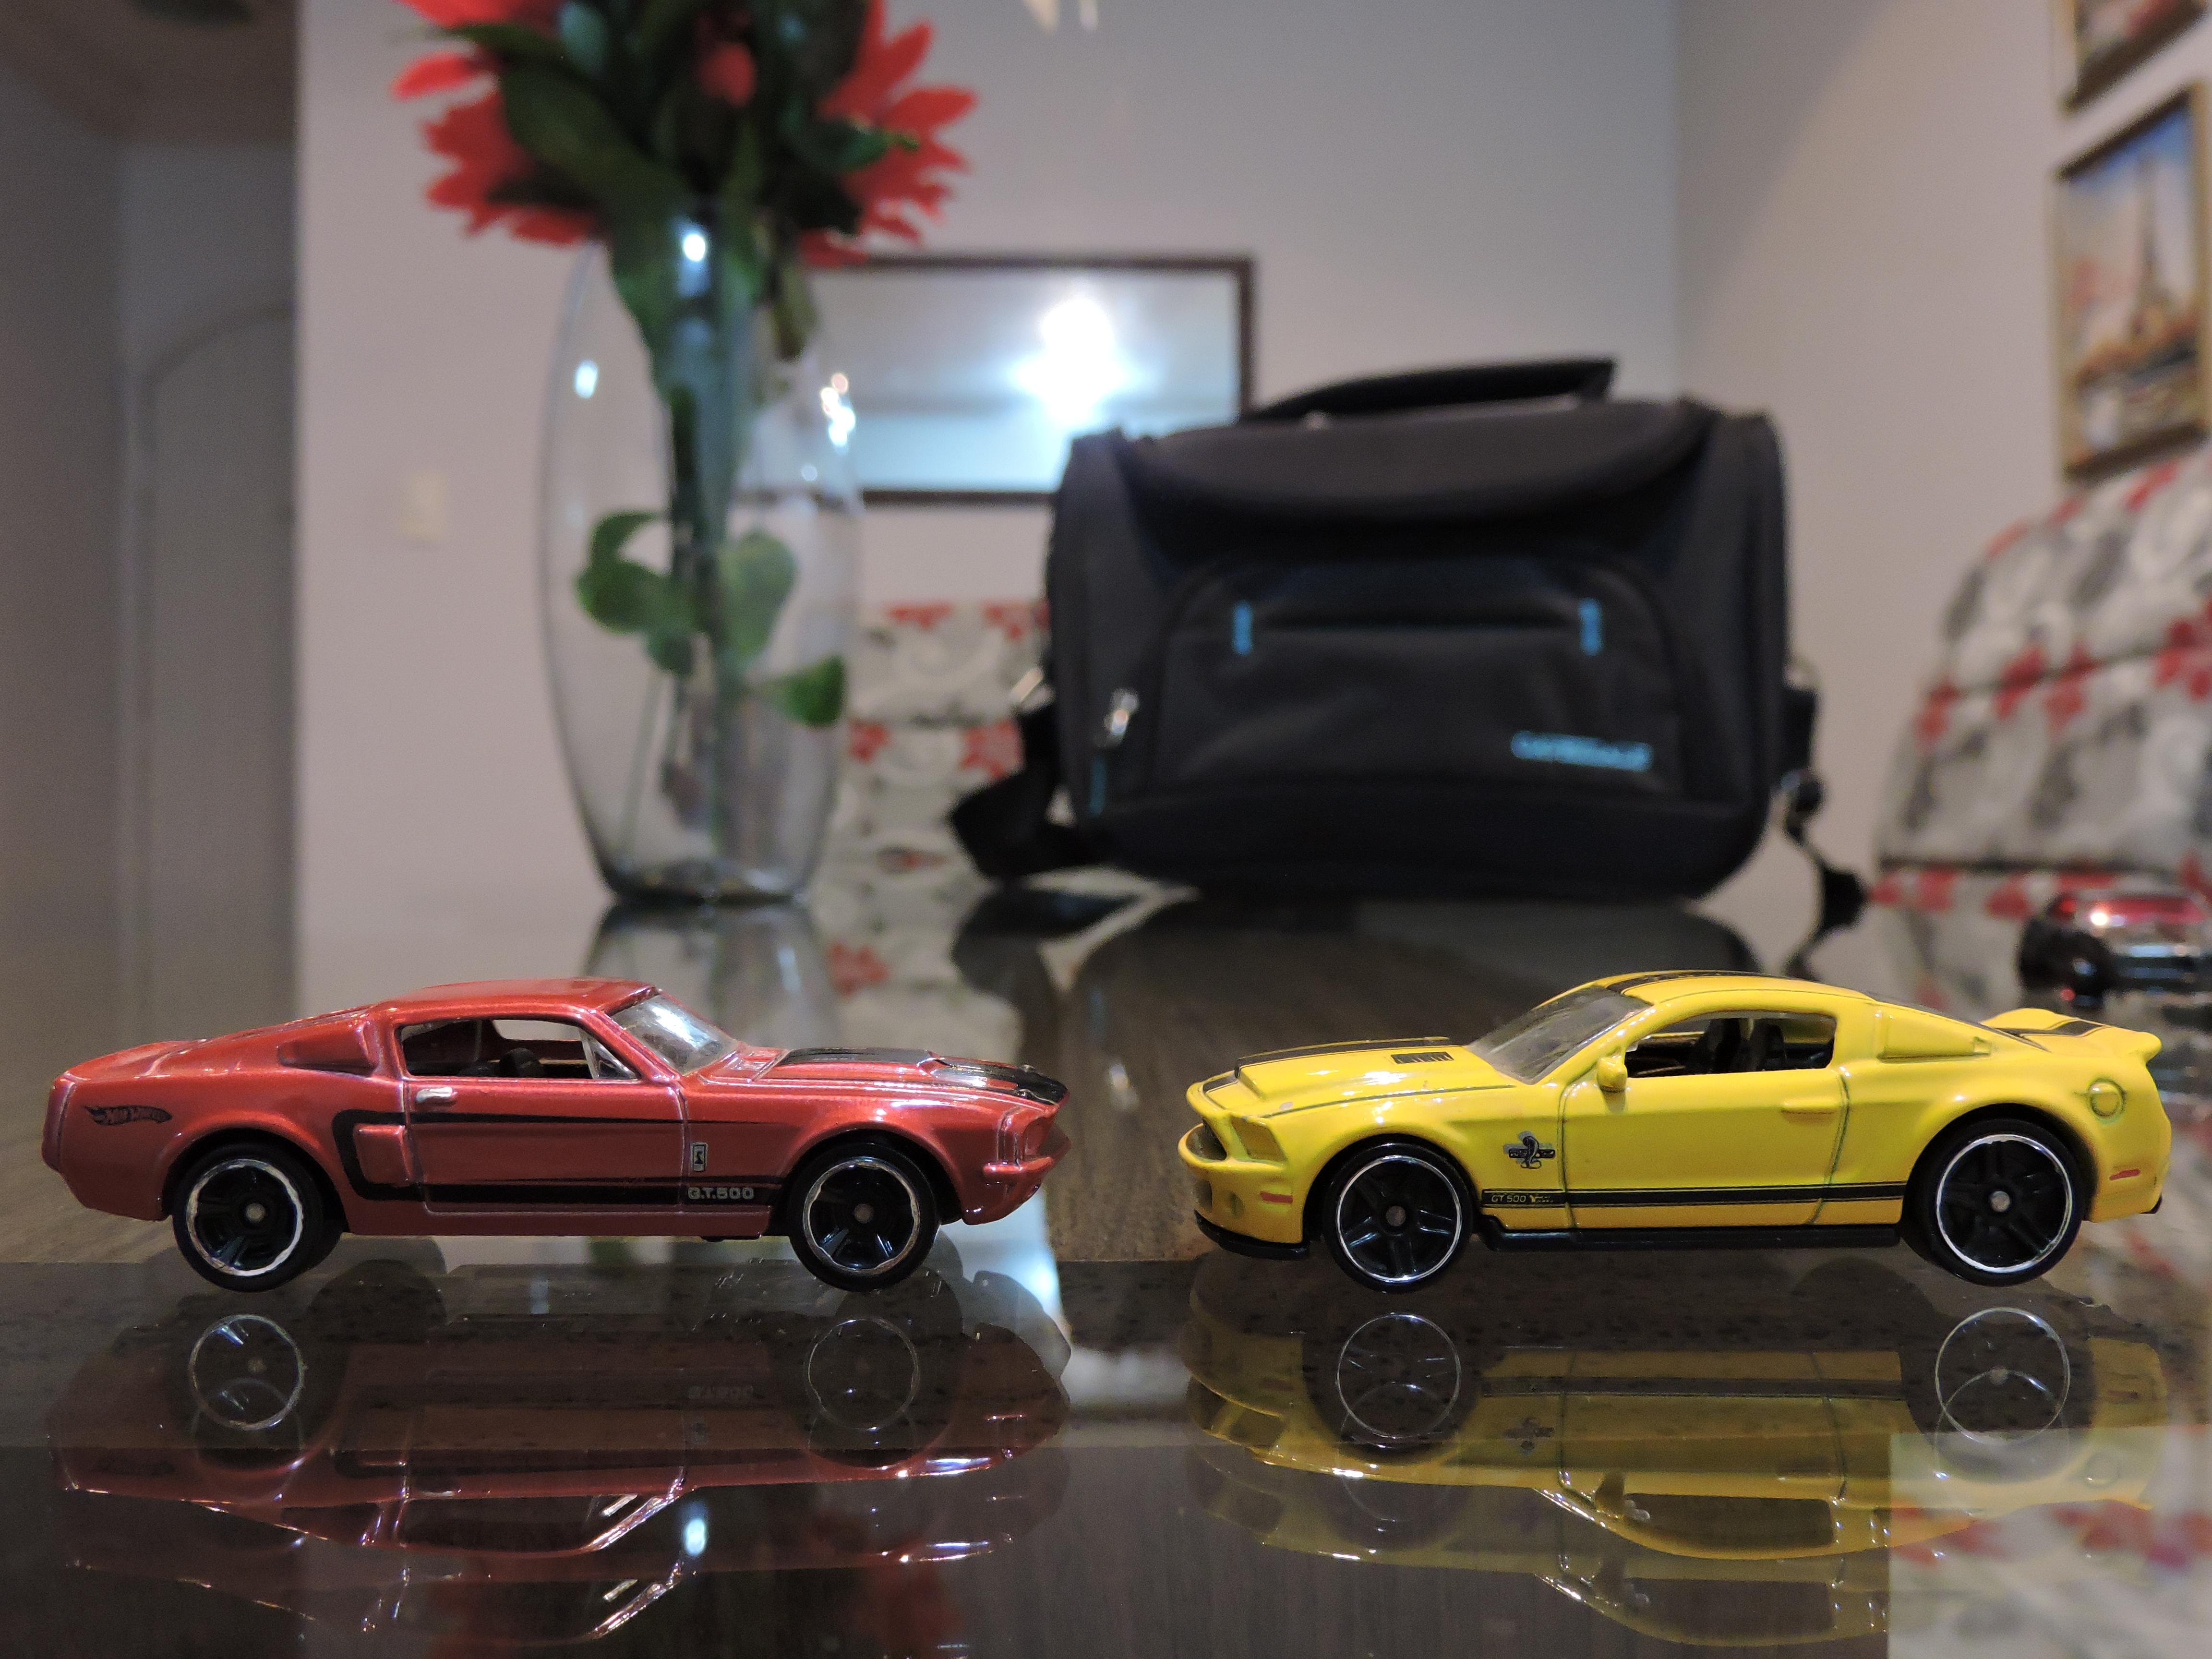 Toy Car Photoshoot